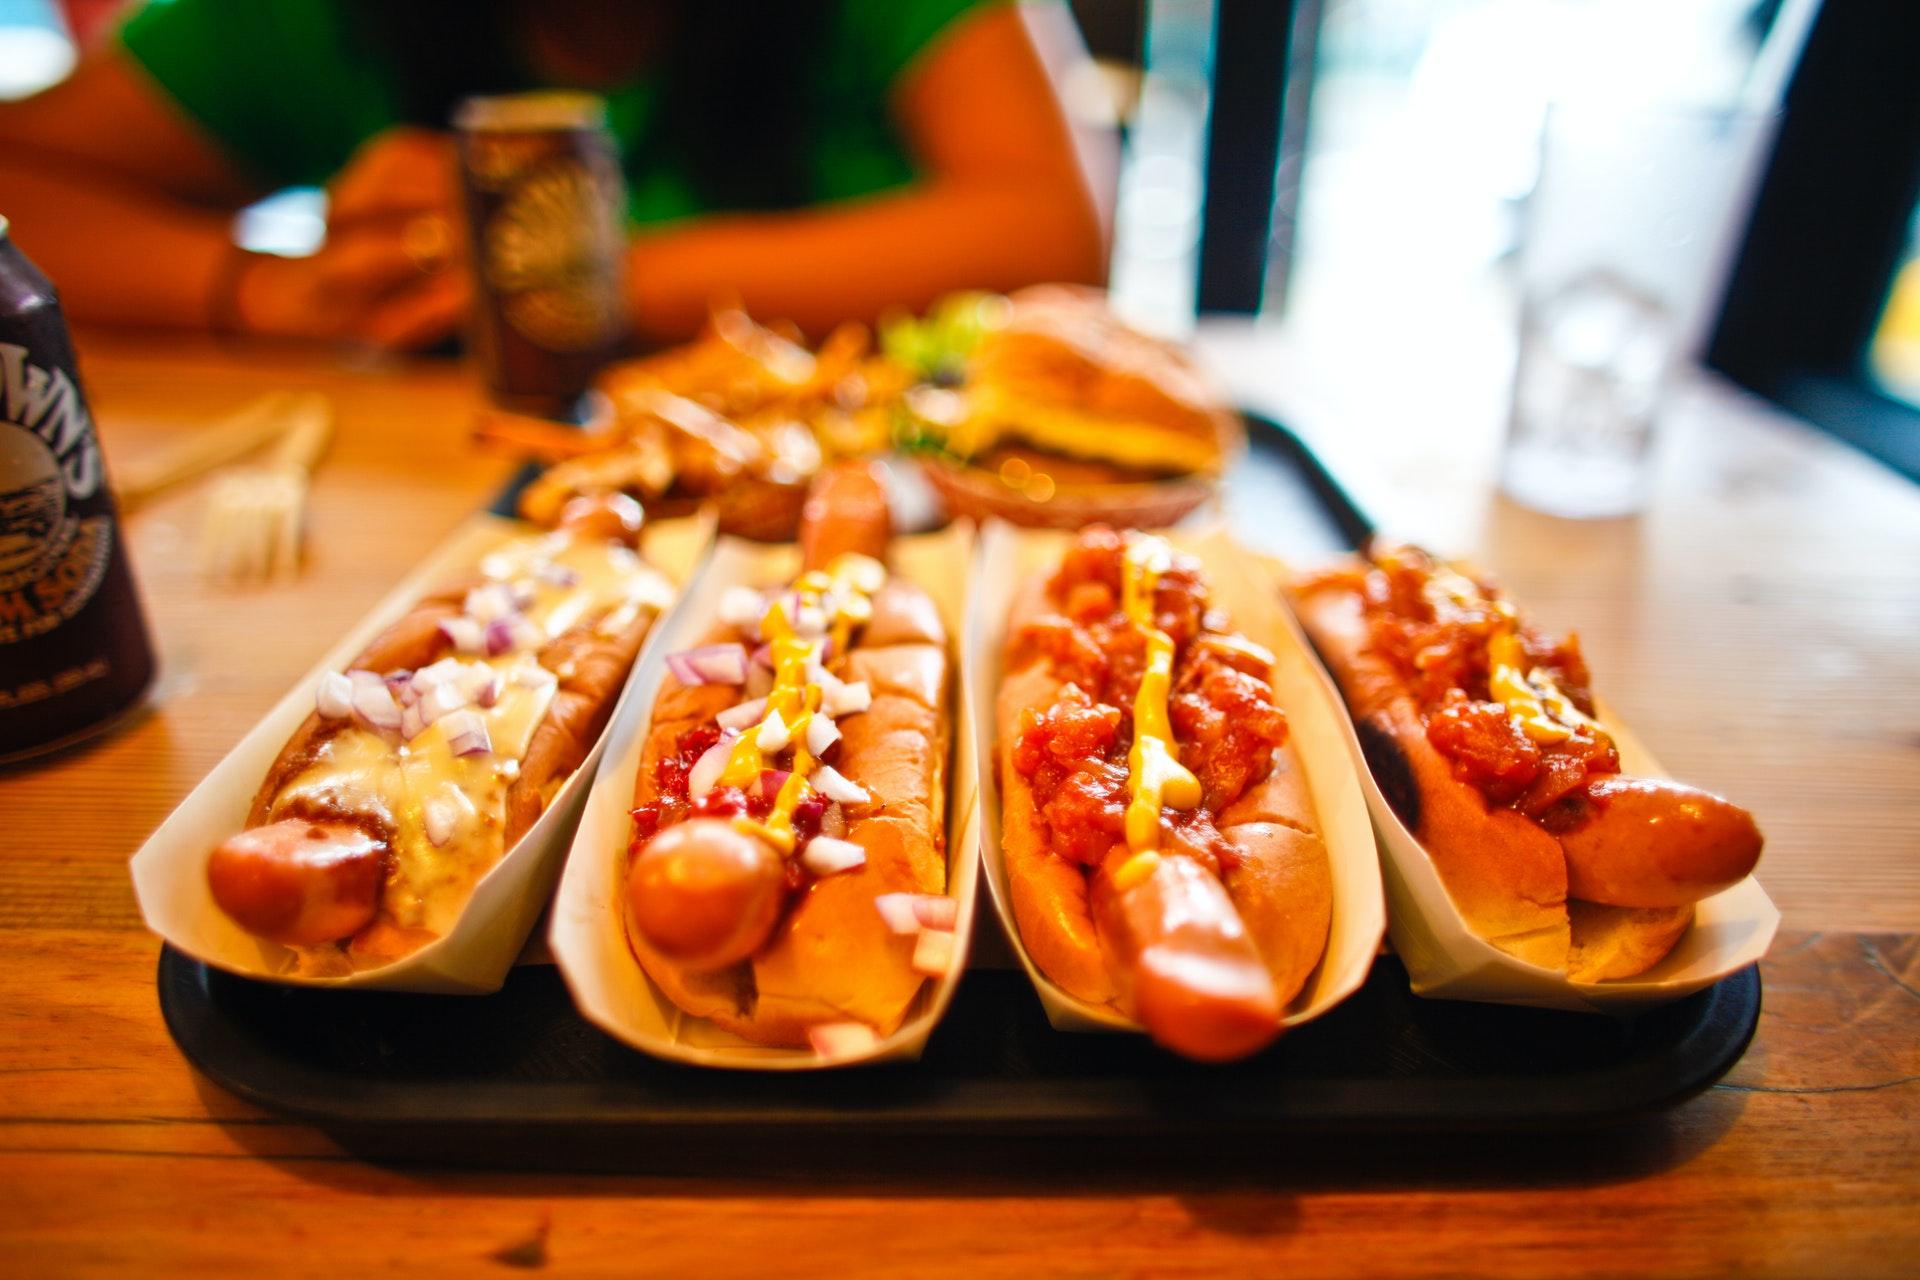 Hotdogs and baseball